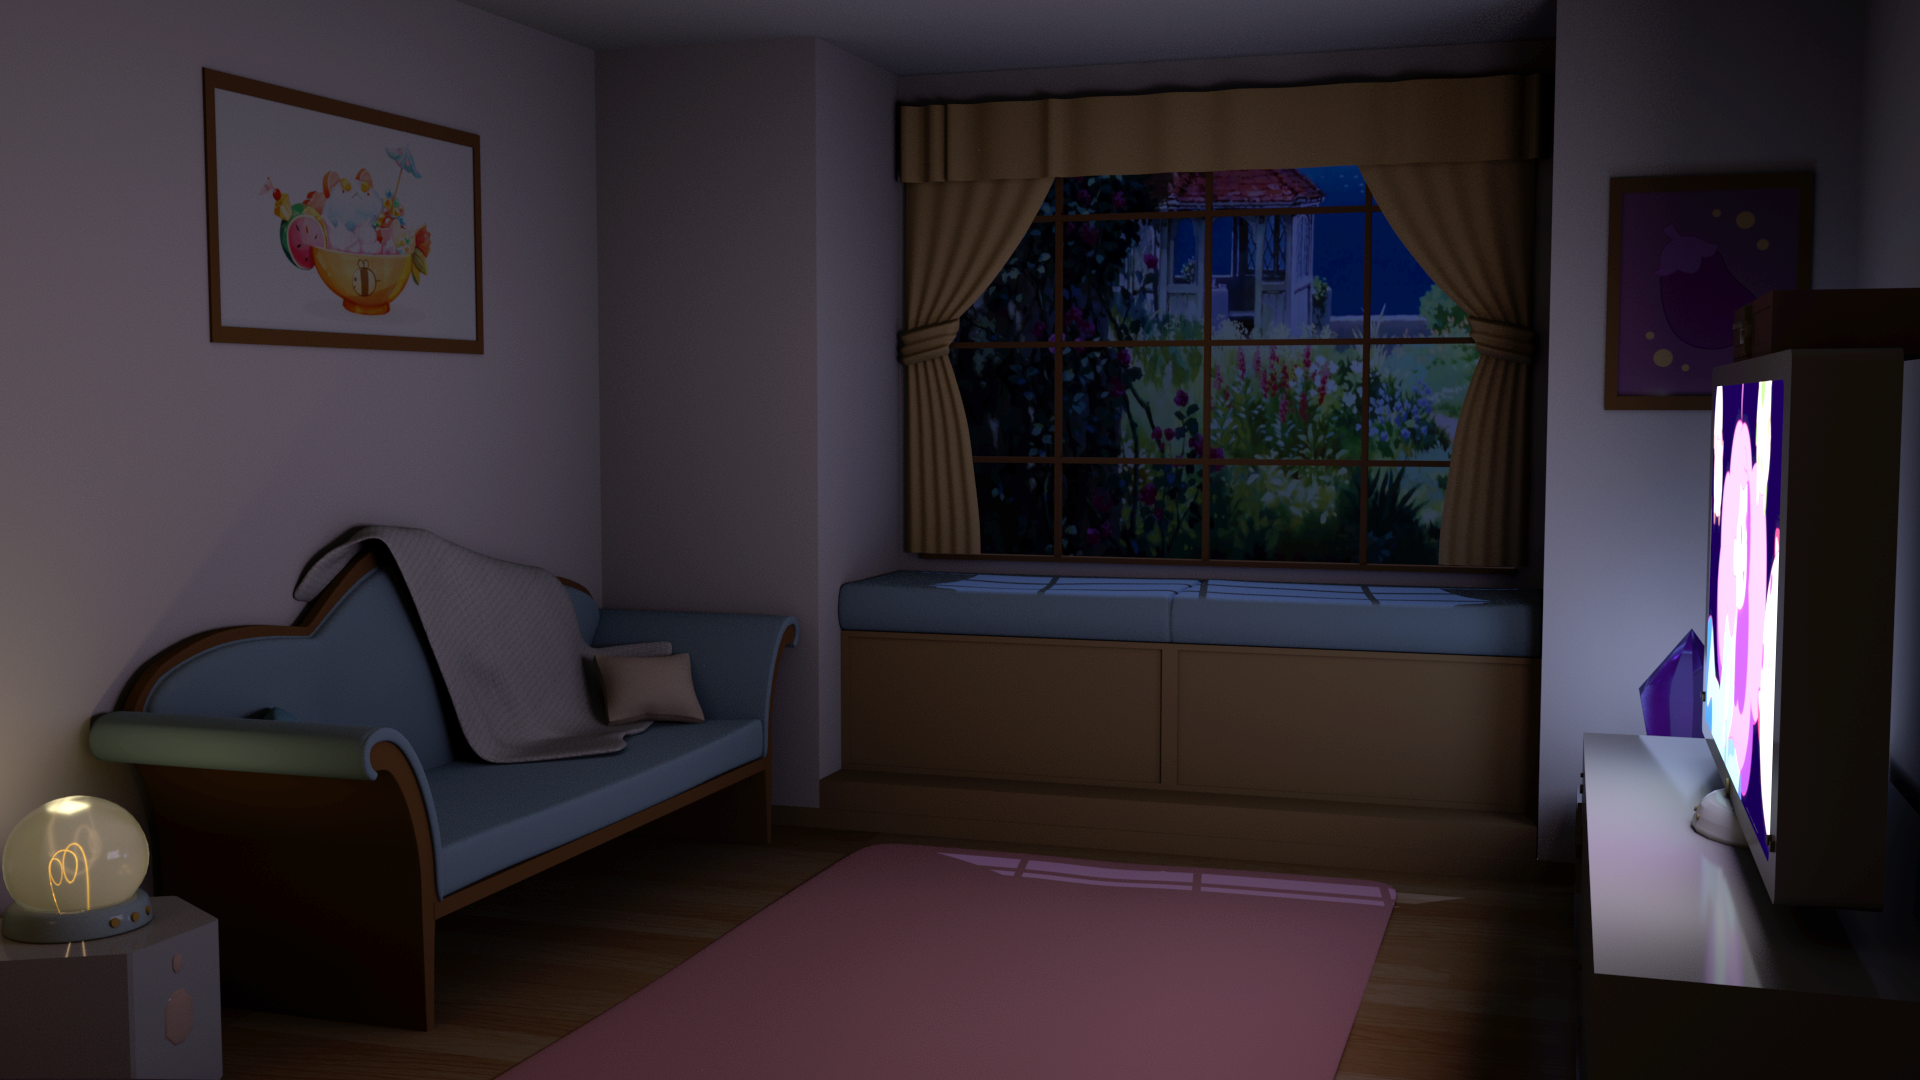 window1_night_final_edit